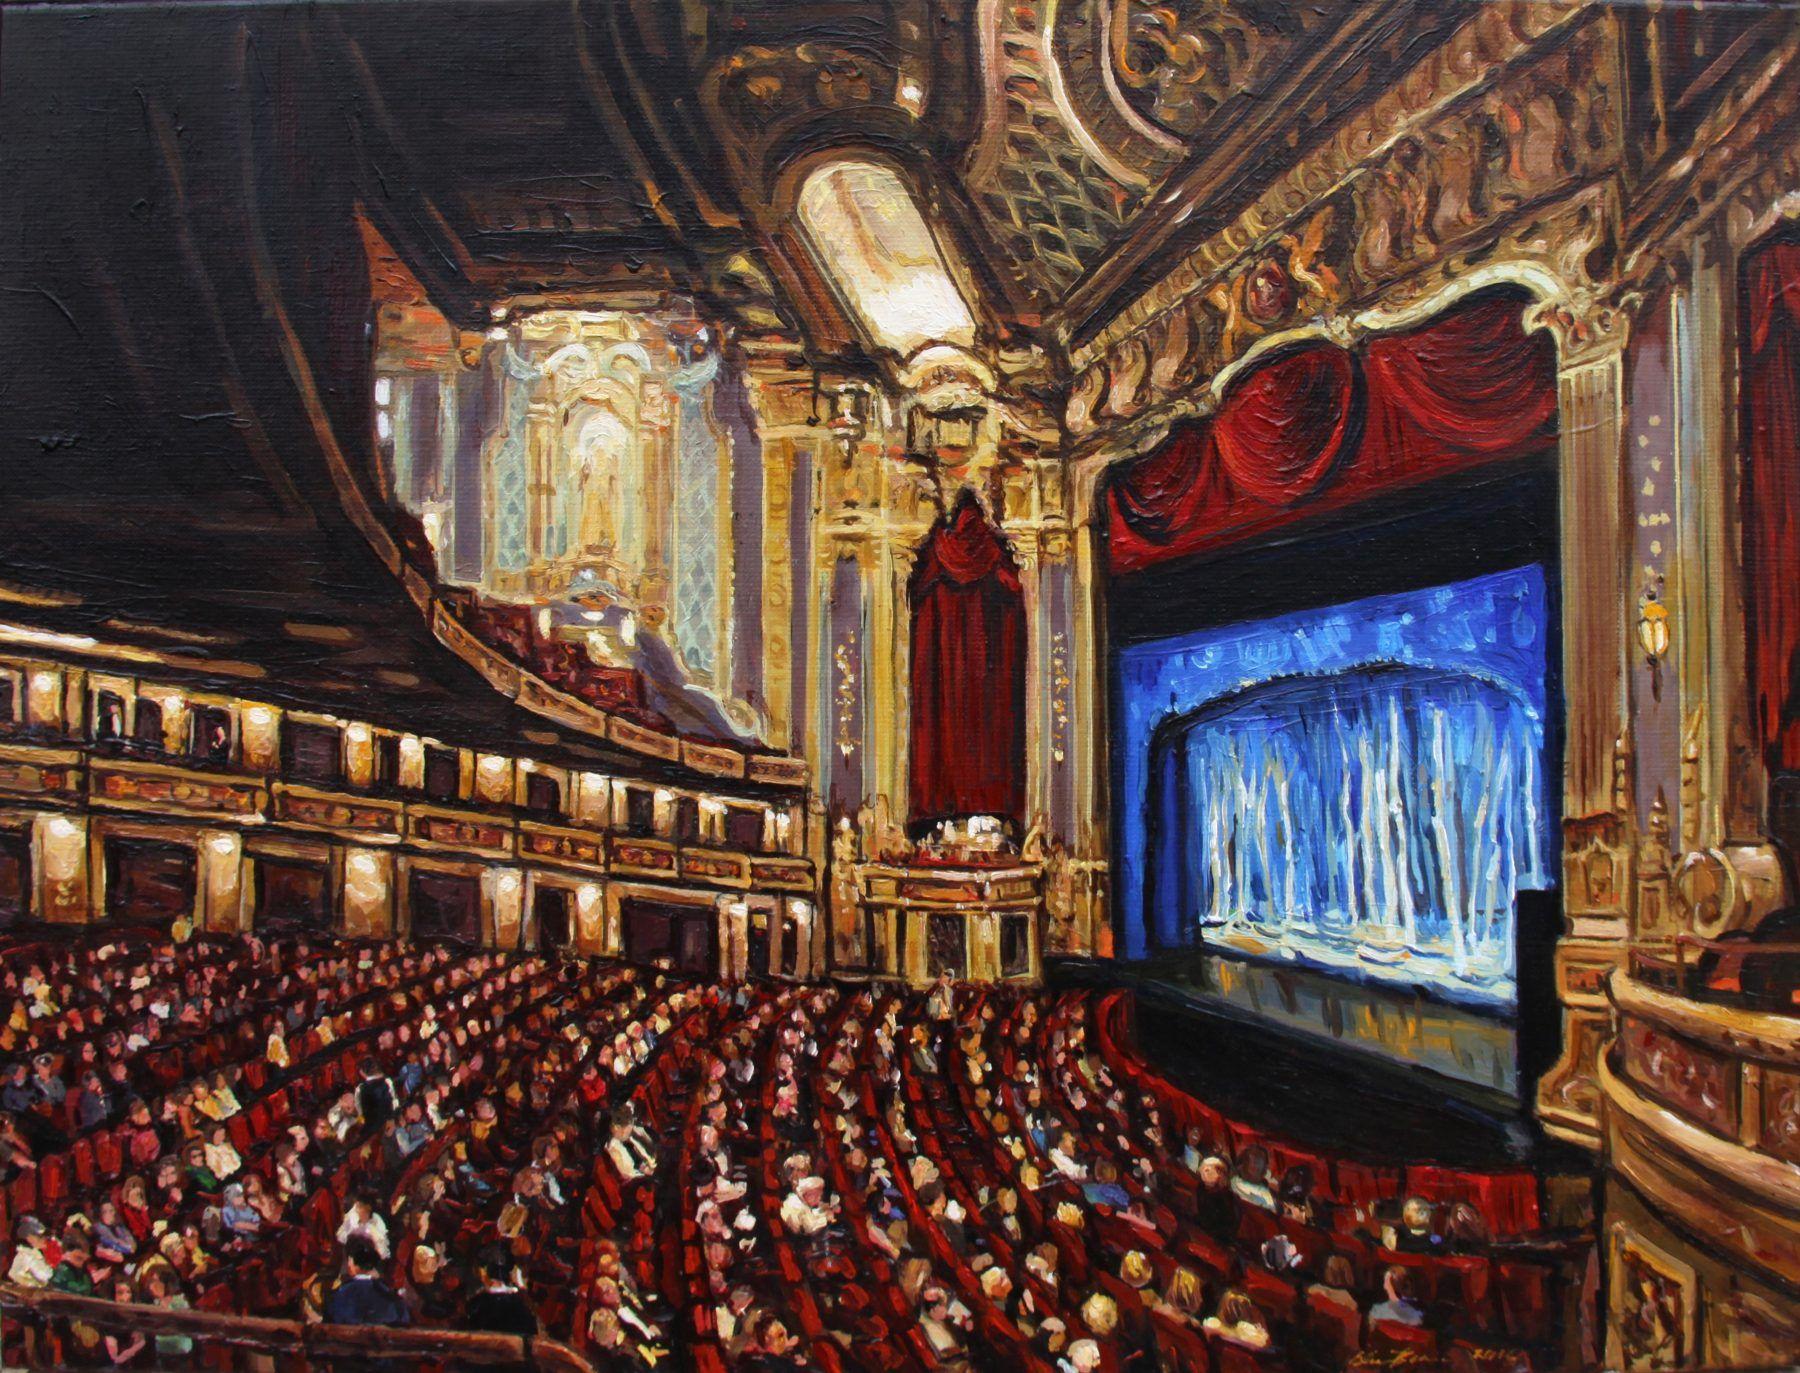 10 Oriental Theater Chicago E1483917340596 Jpg 1 800 1 373 Pixels Oriental Theater Chicago Theater Chicago Oriental Theater